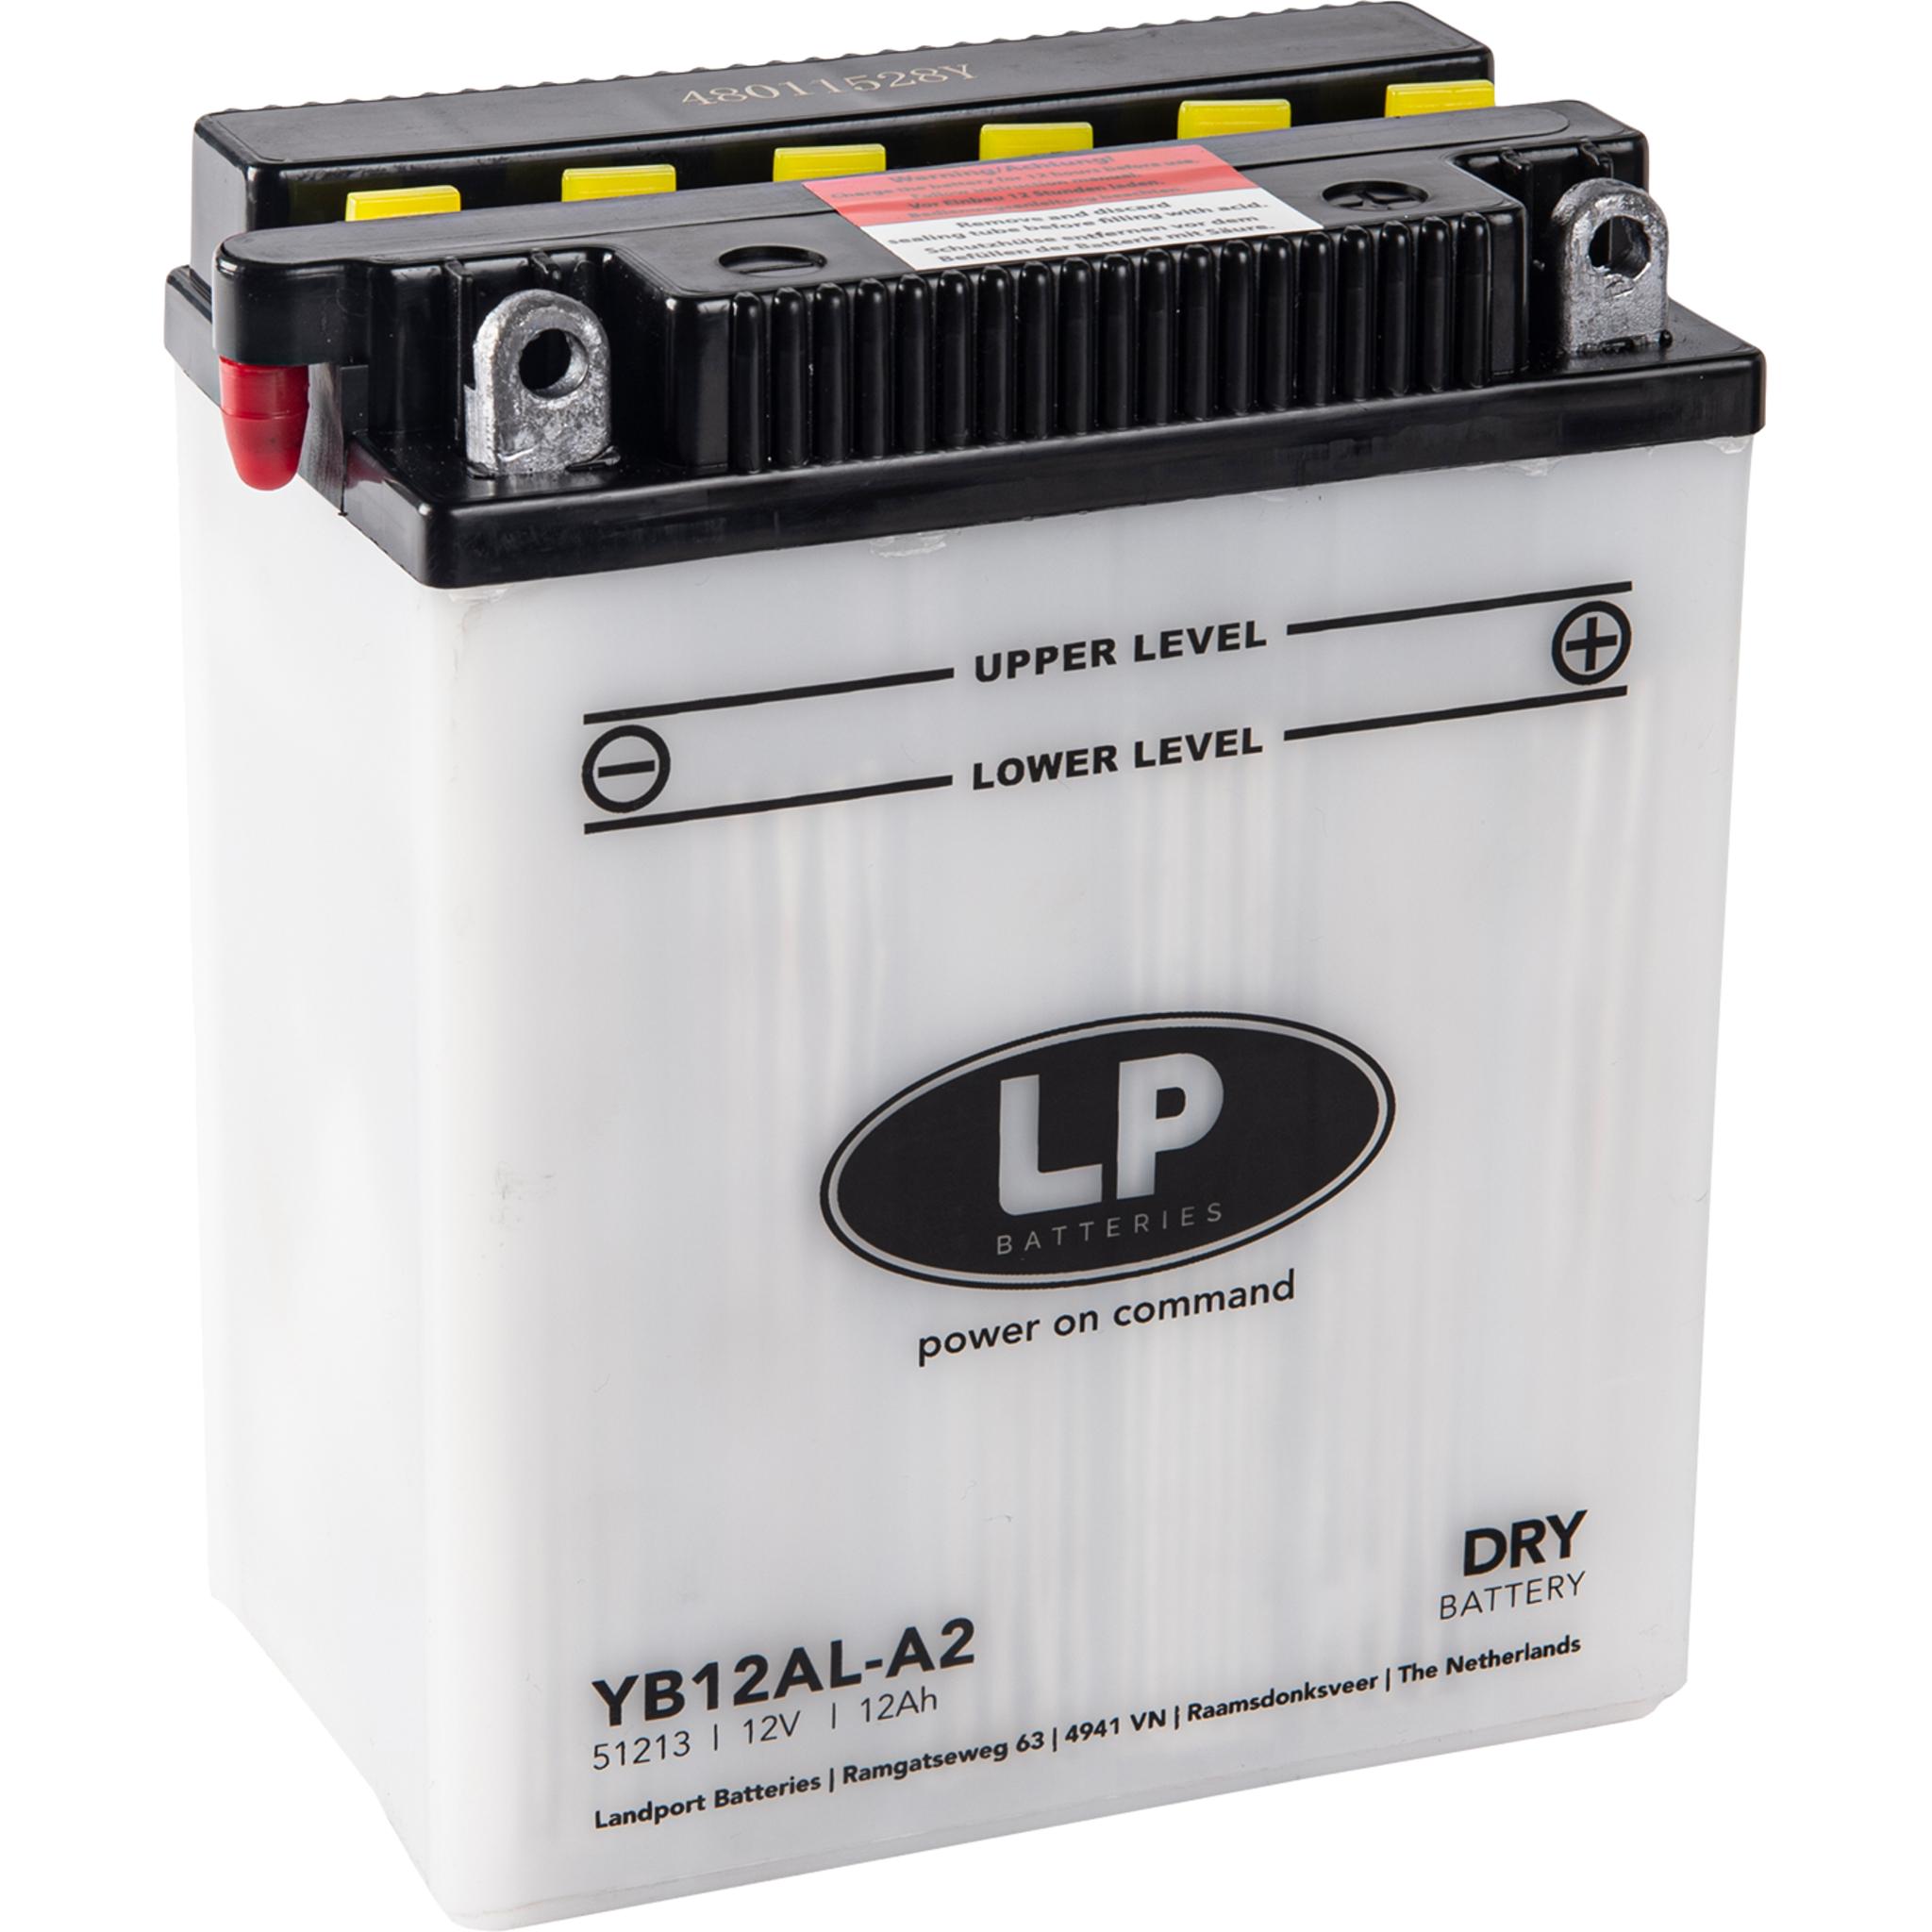 Аккумулятор Landport YB12AL-A2, 12V, DRY